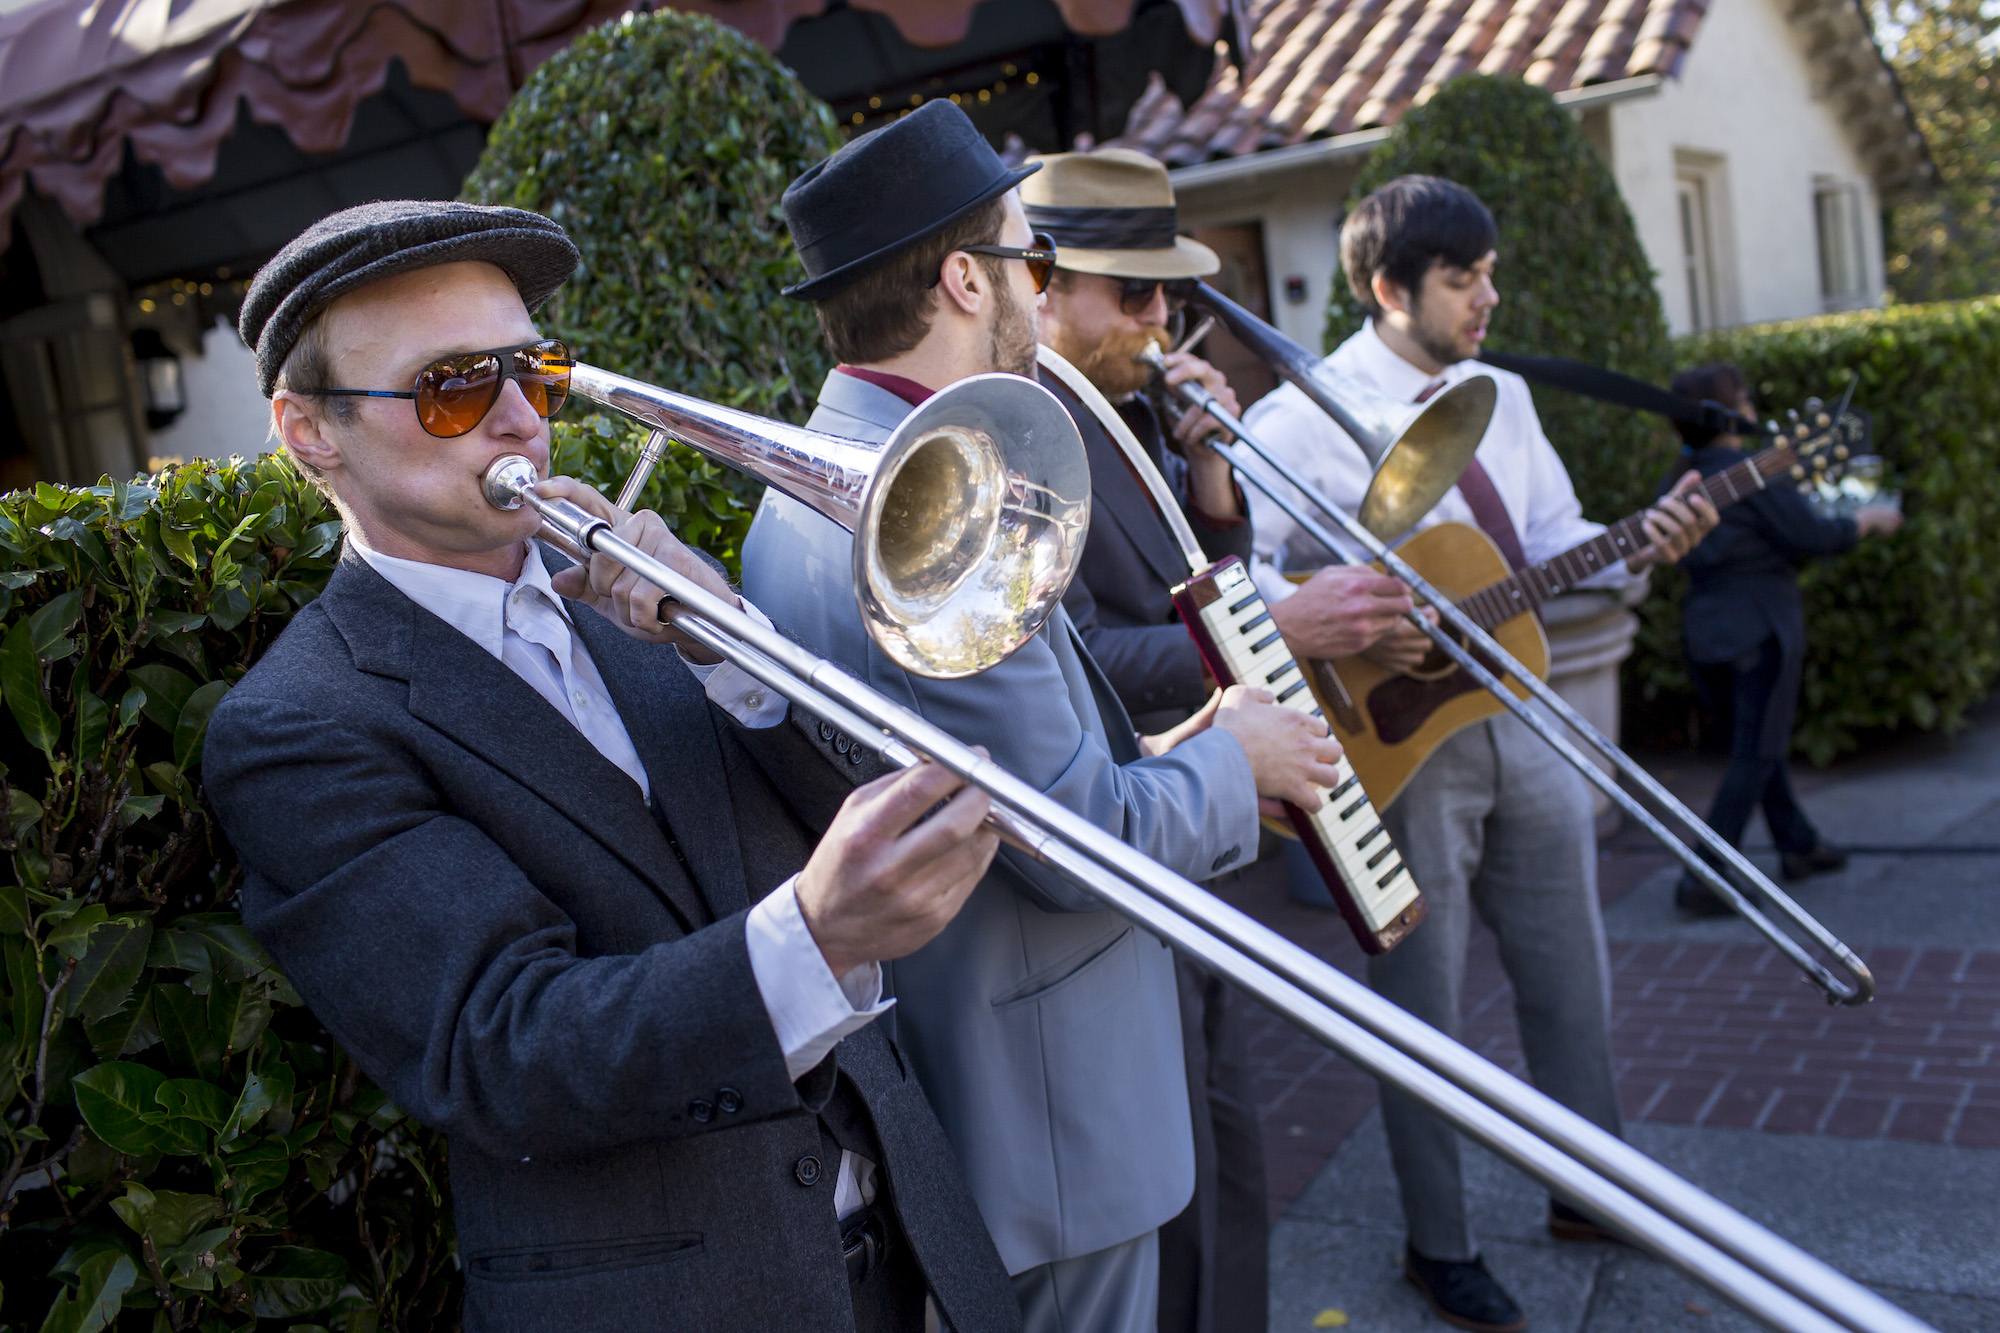 oakland-hills-jewish-wedding-deborah-coleman-photos20